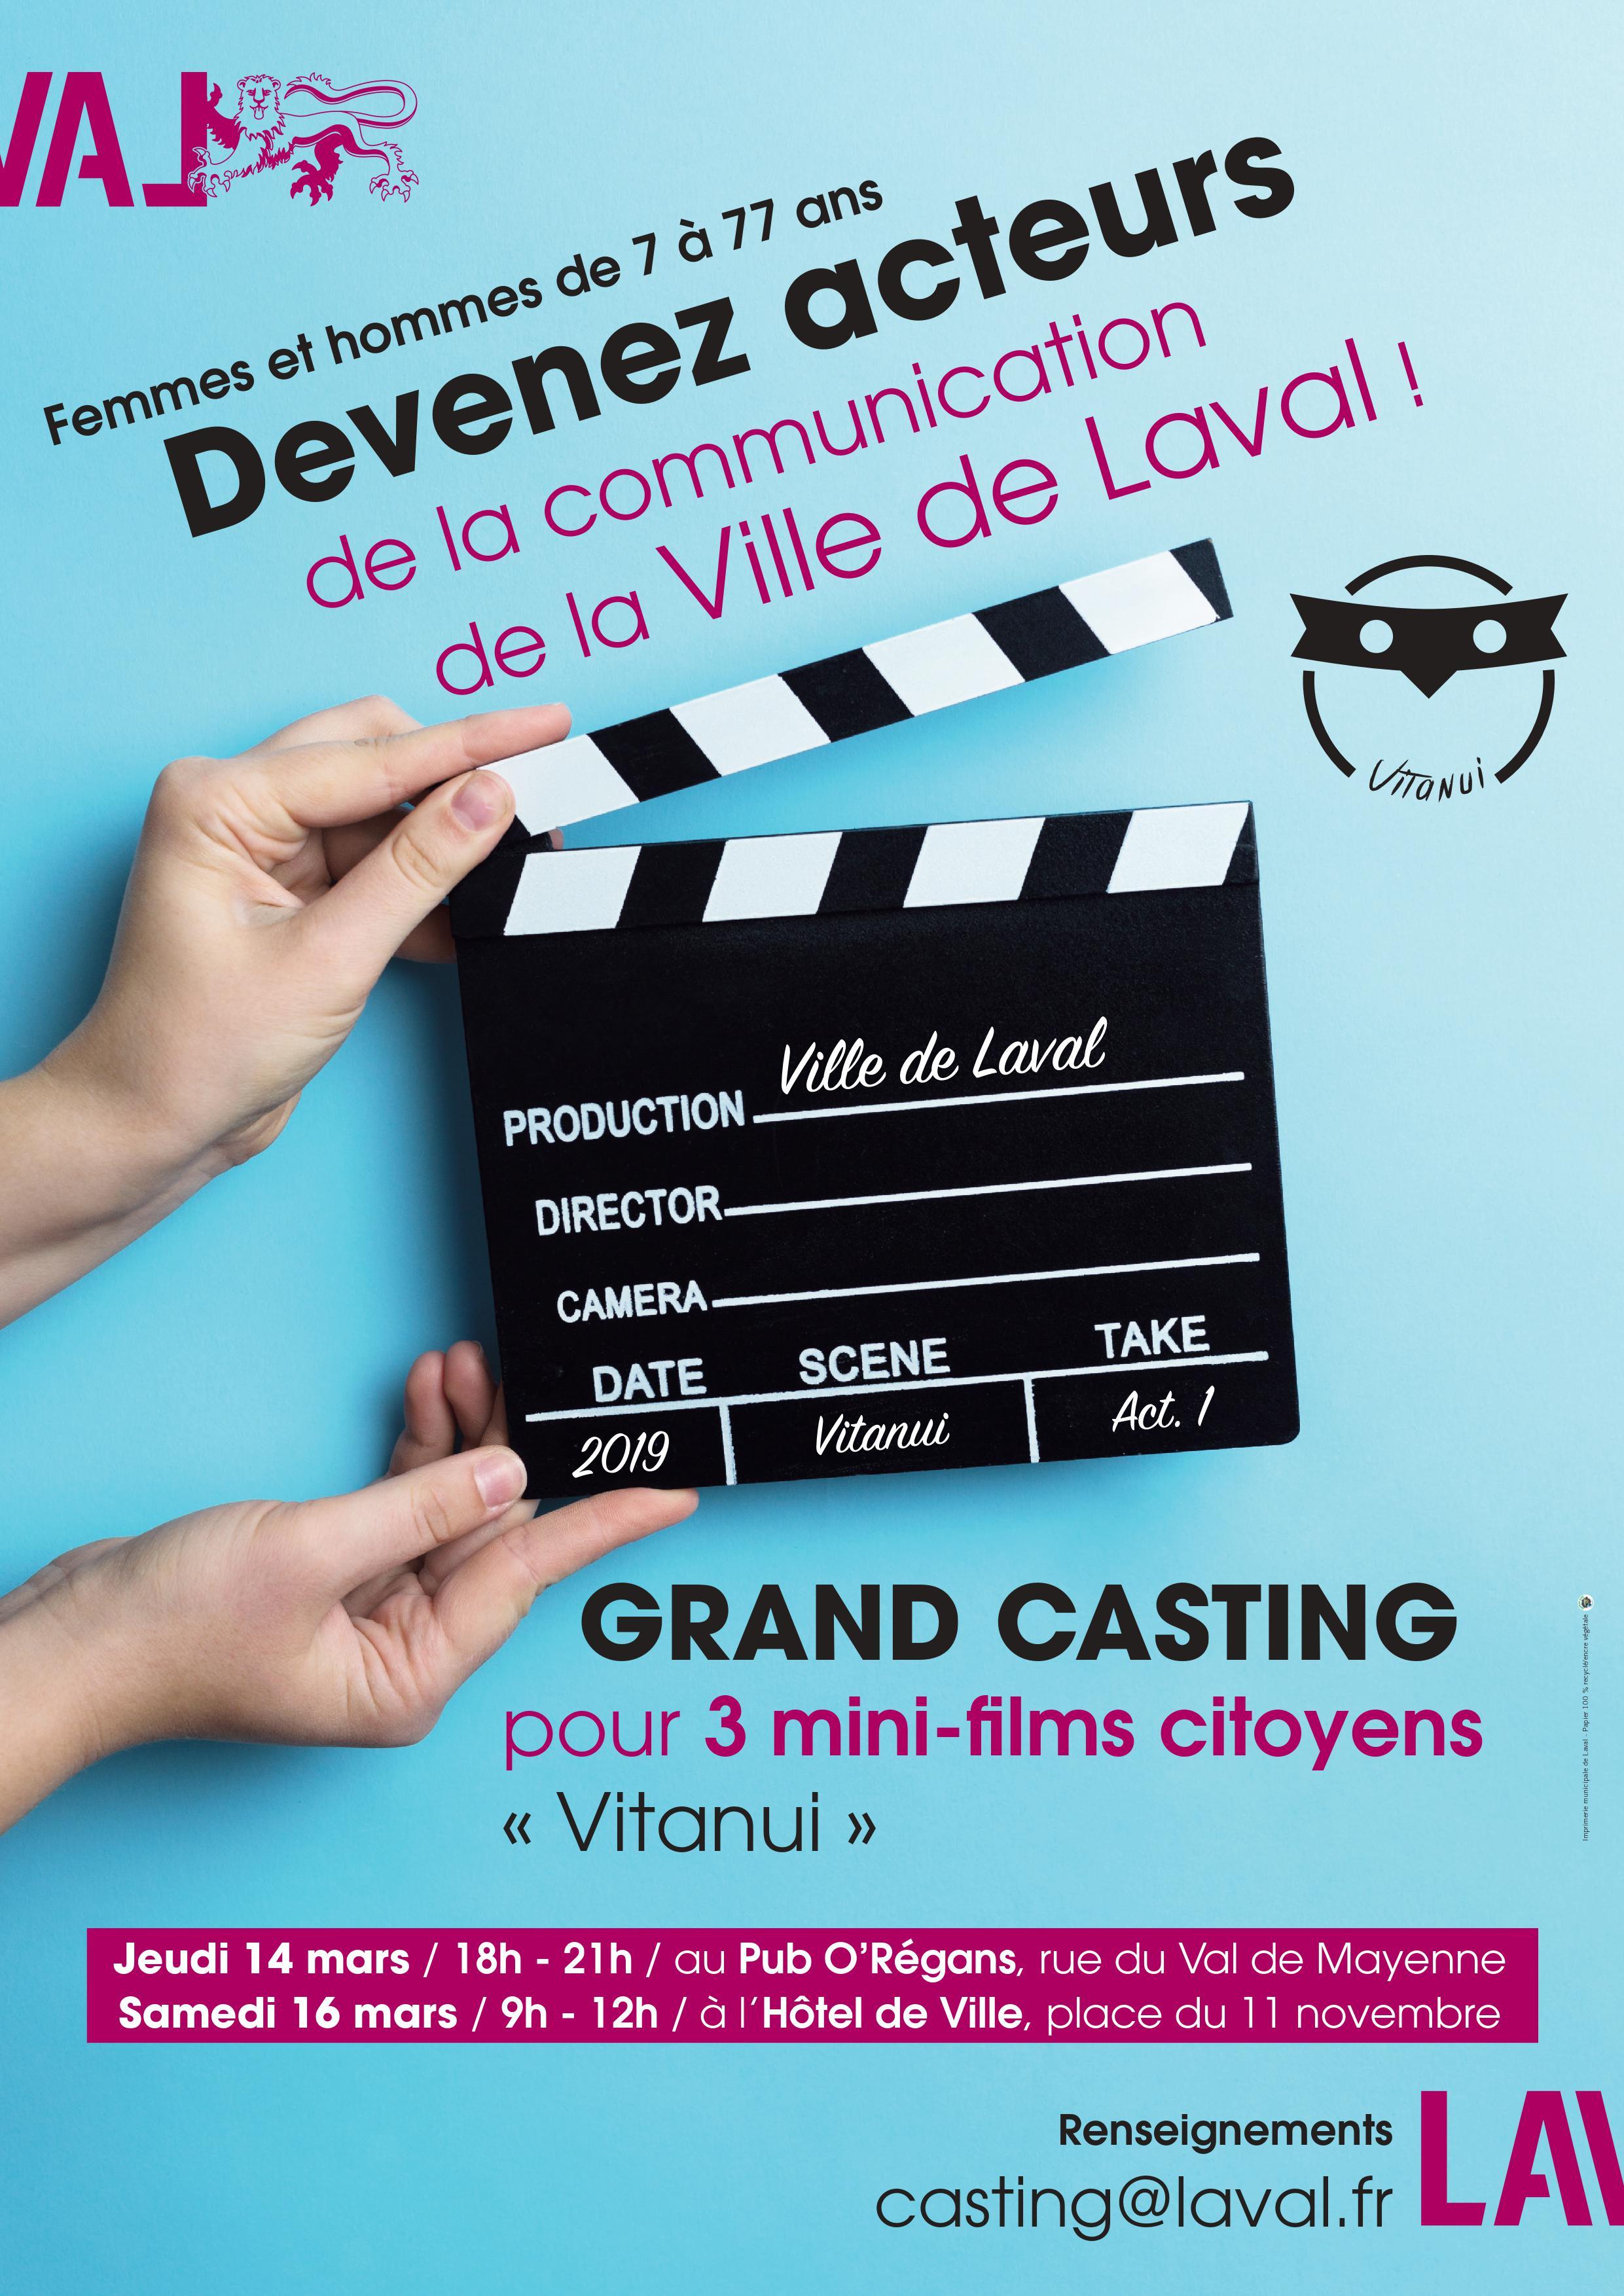 Grand Casting pour 3 mini-films citoyens